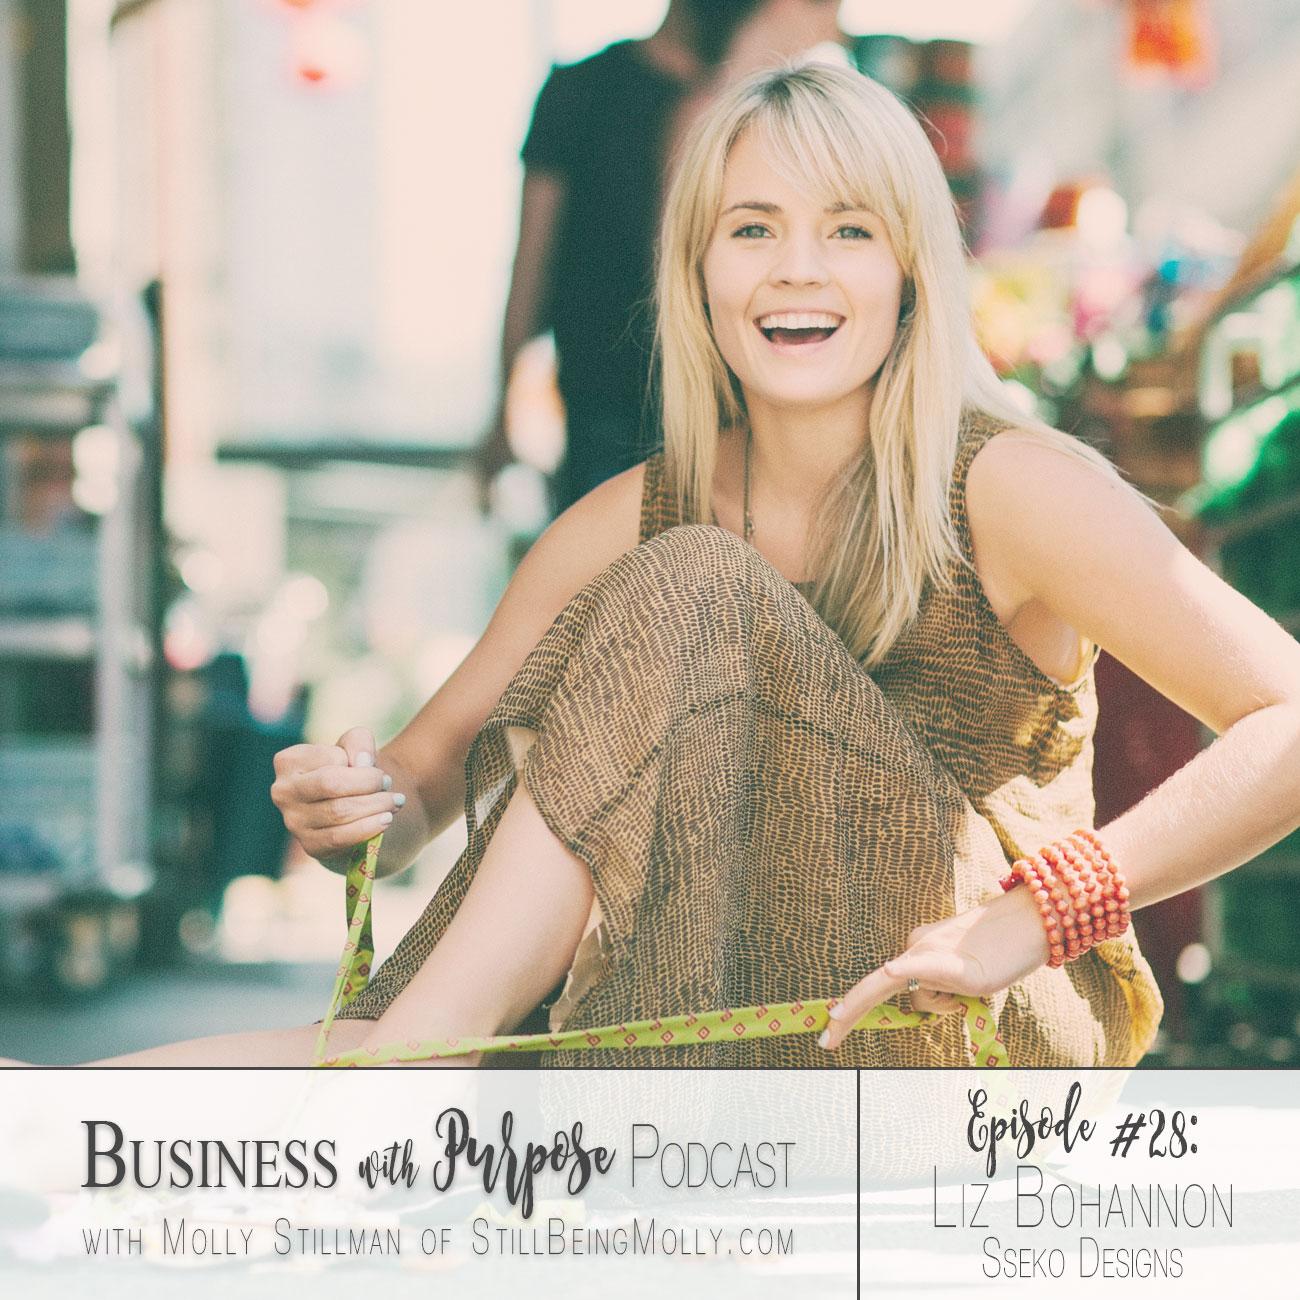 EP. 28: Liz Bohannon, Founder of Sseko Designs